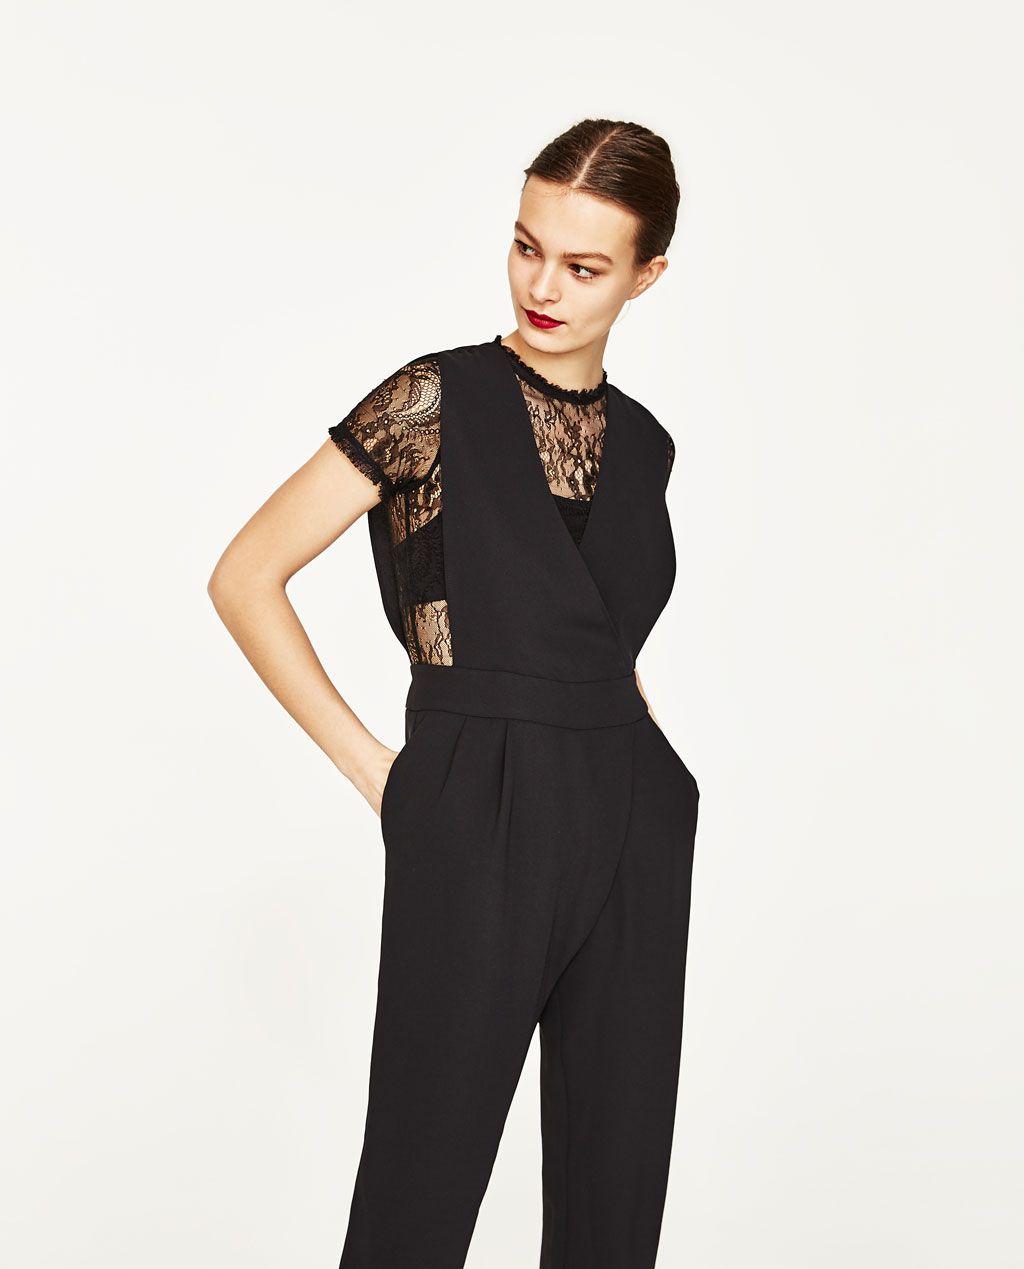 zara - woman - contrast lace jumpsuit | zara overall